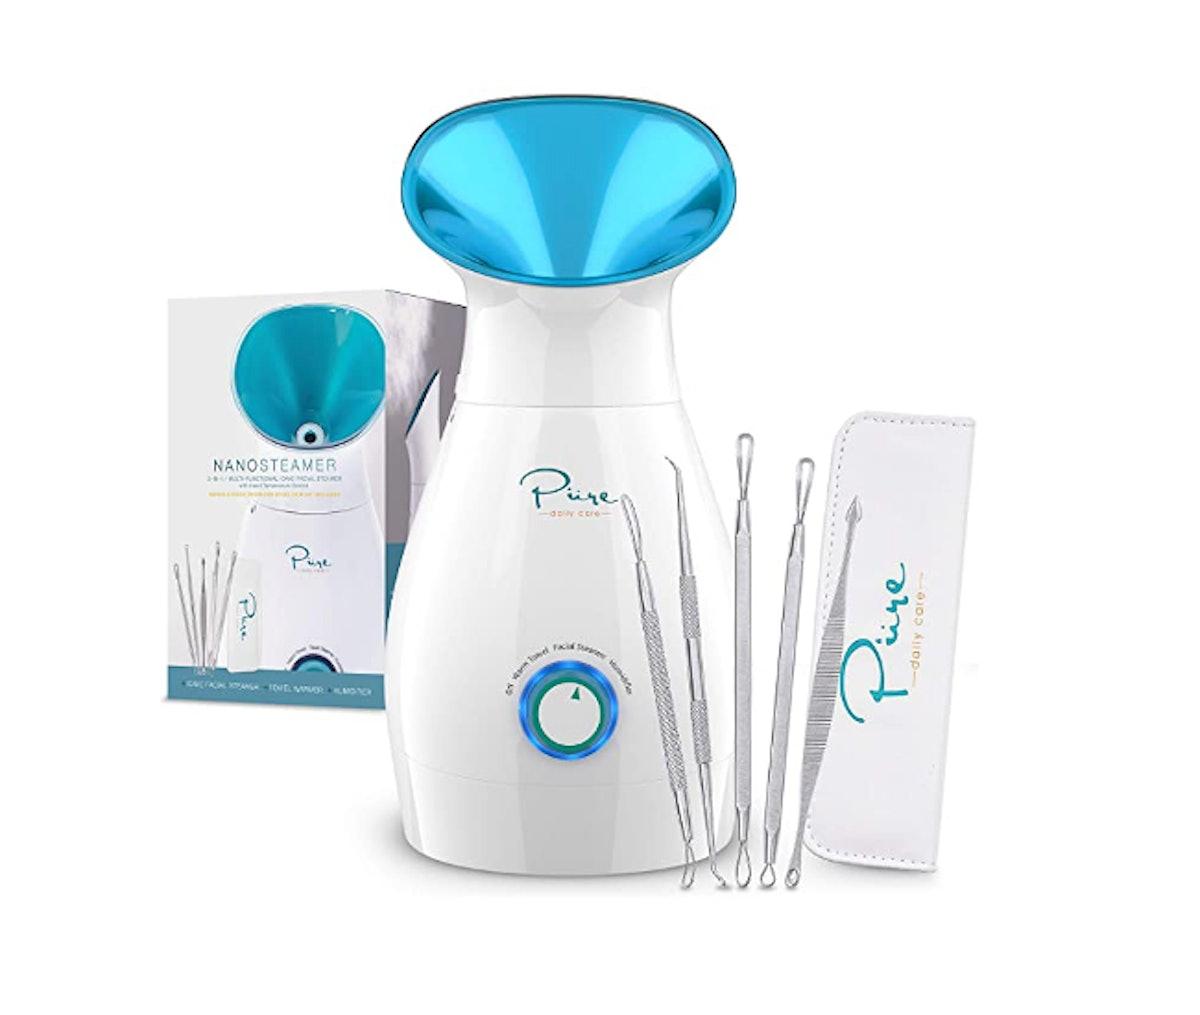 Pure Daily Care 3-in-1 Nano Ionic Facial Steamer